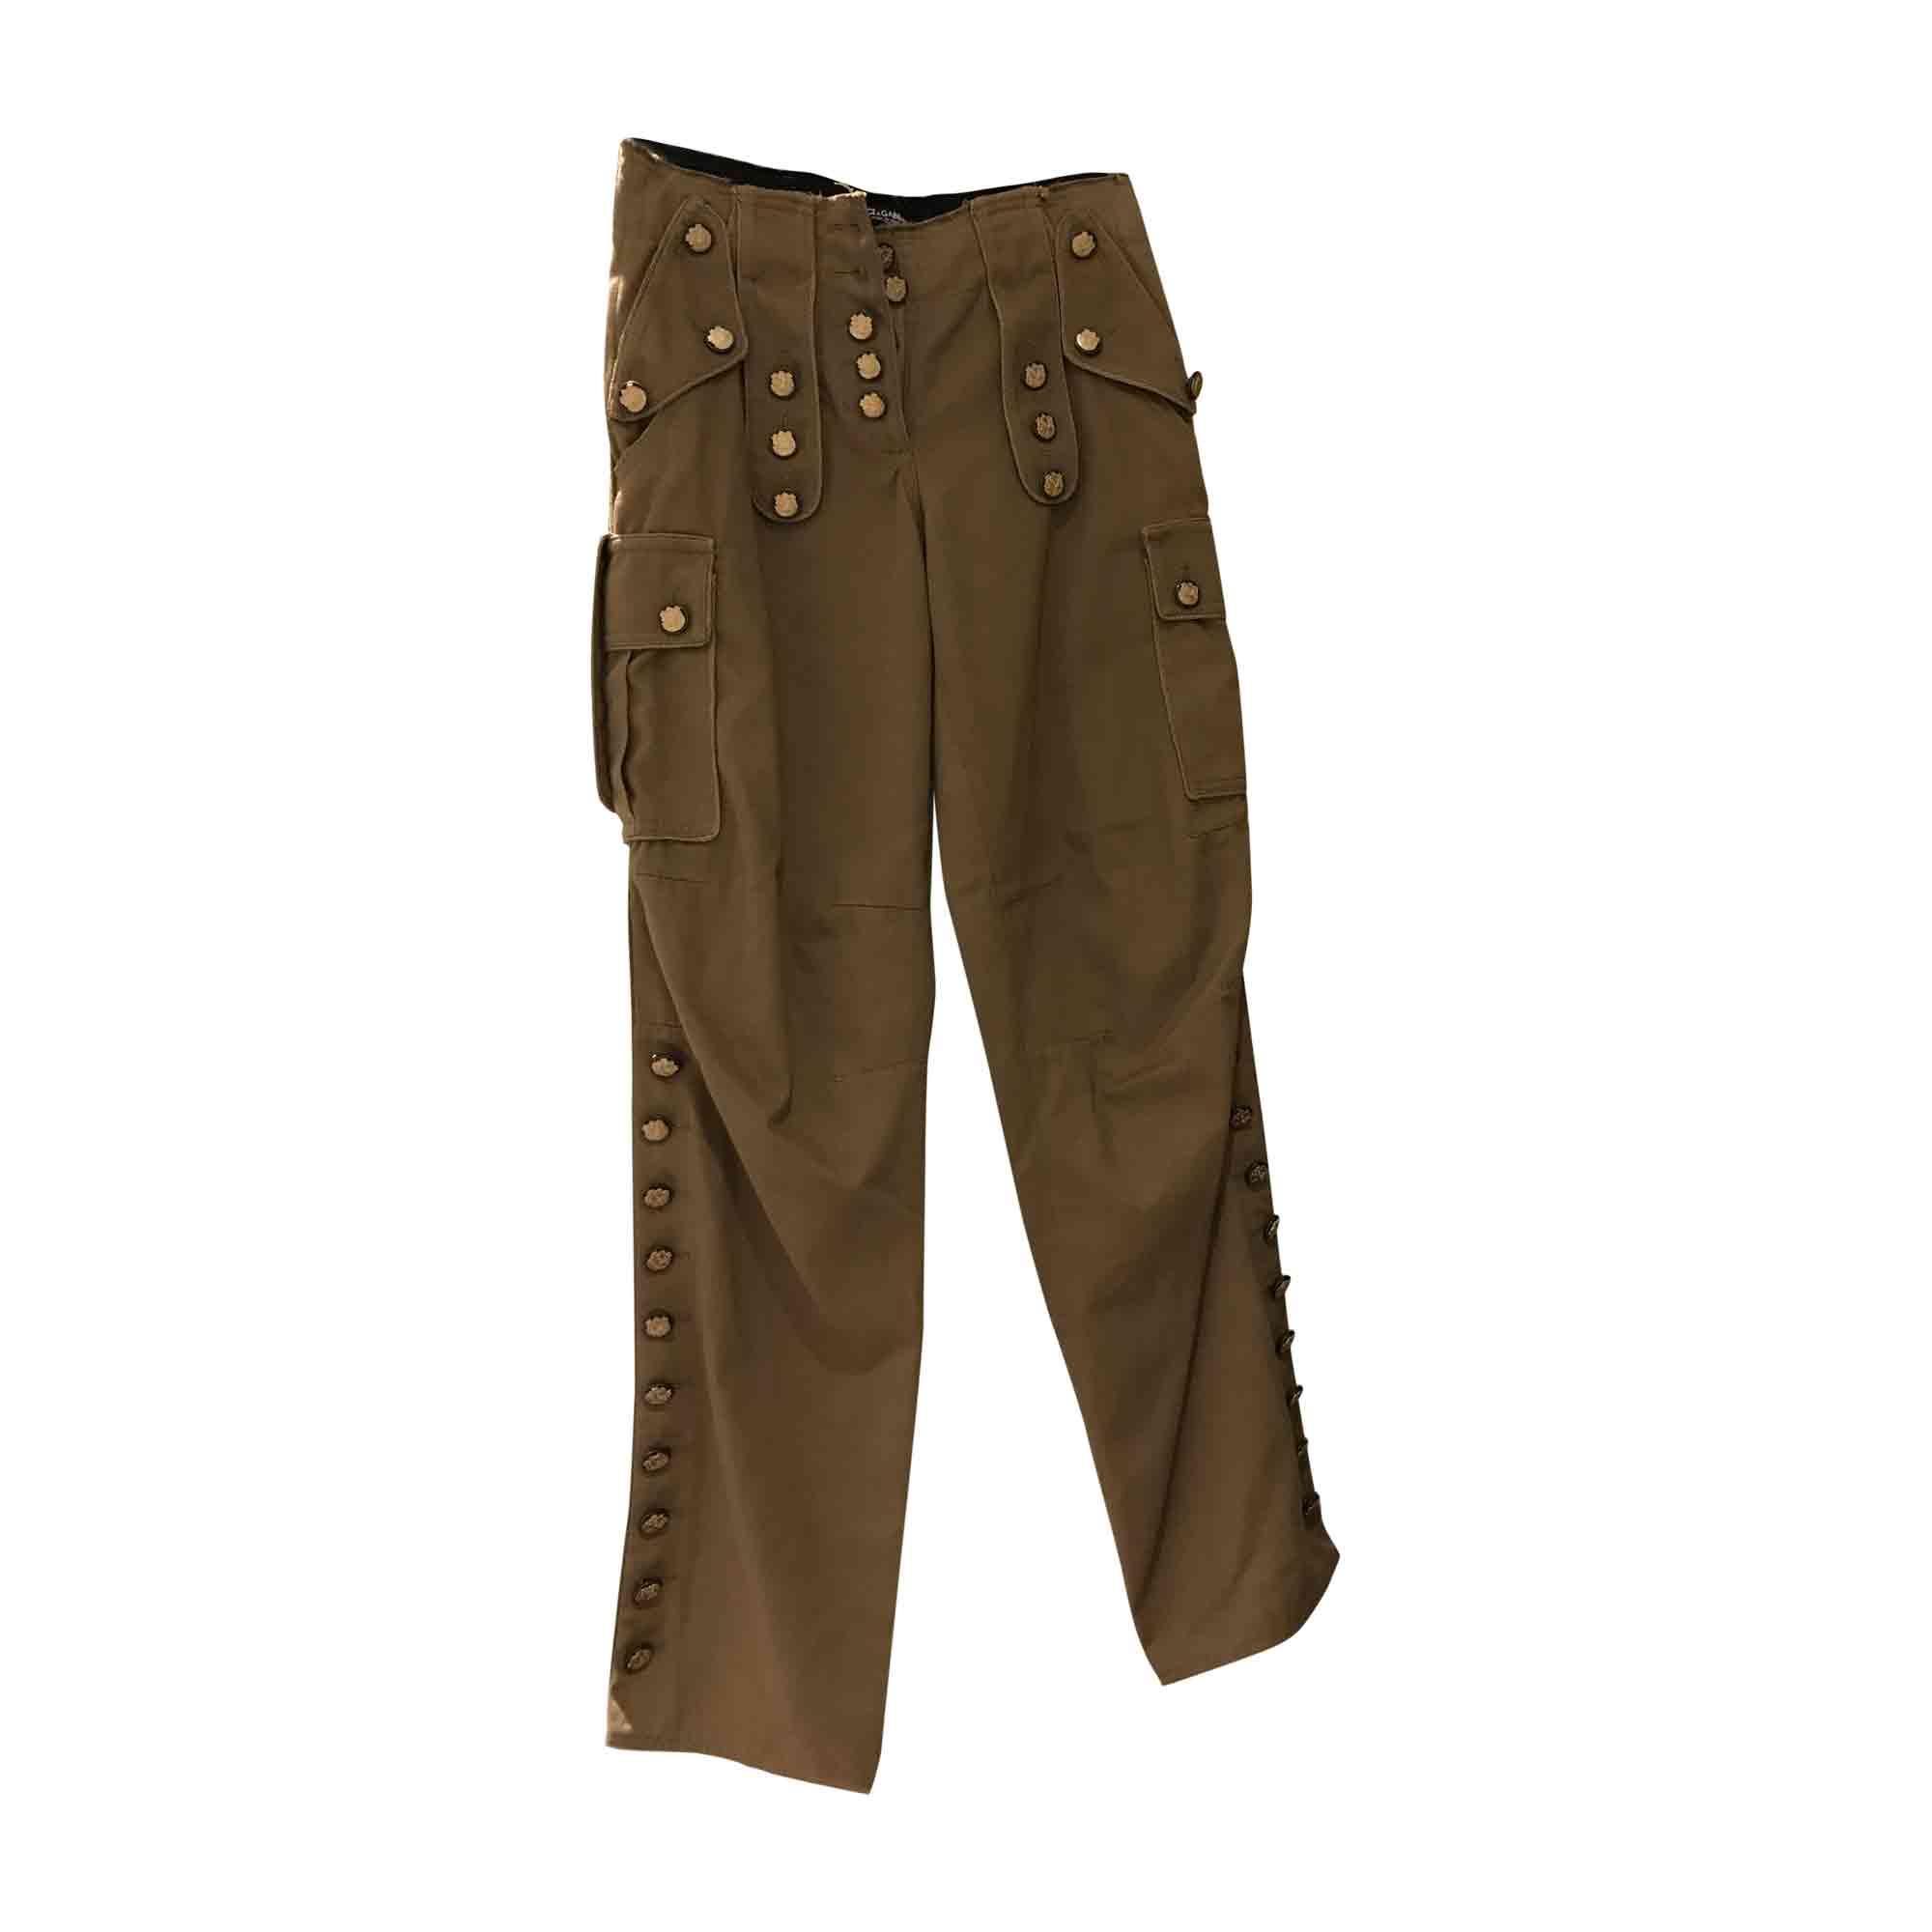 Pantalon droit DOLCE & GABBANA Beige, camel